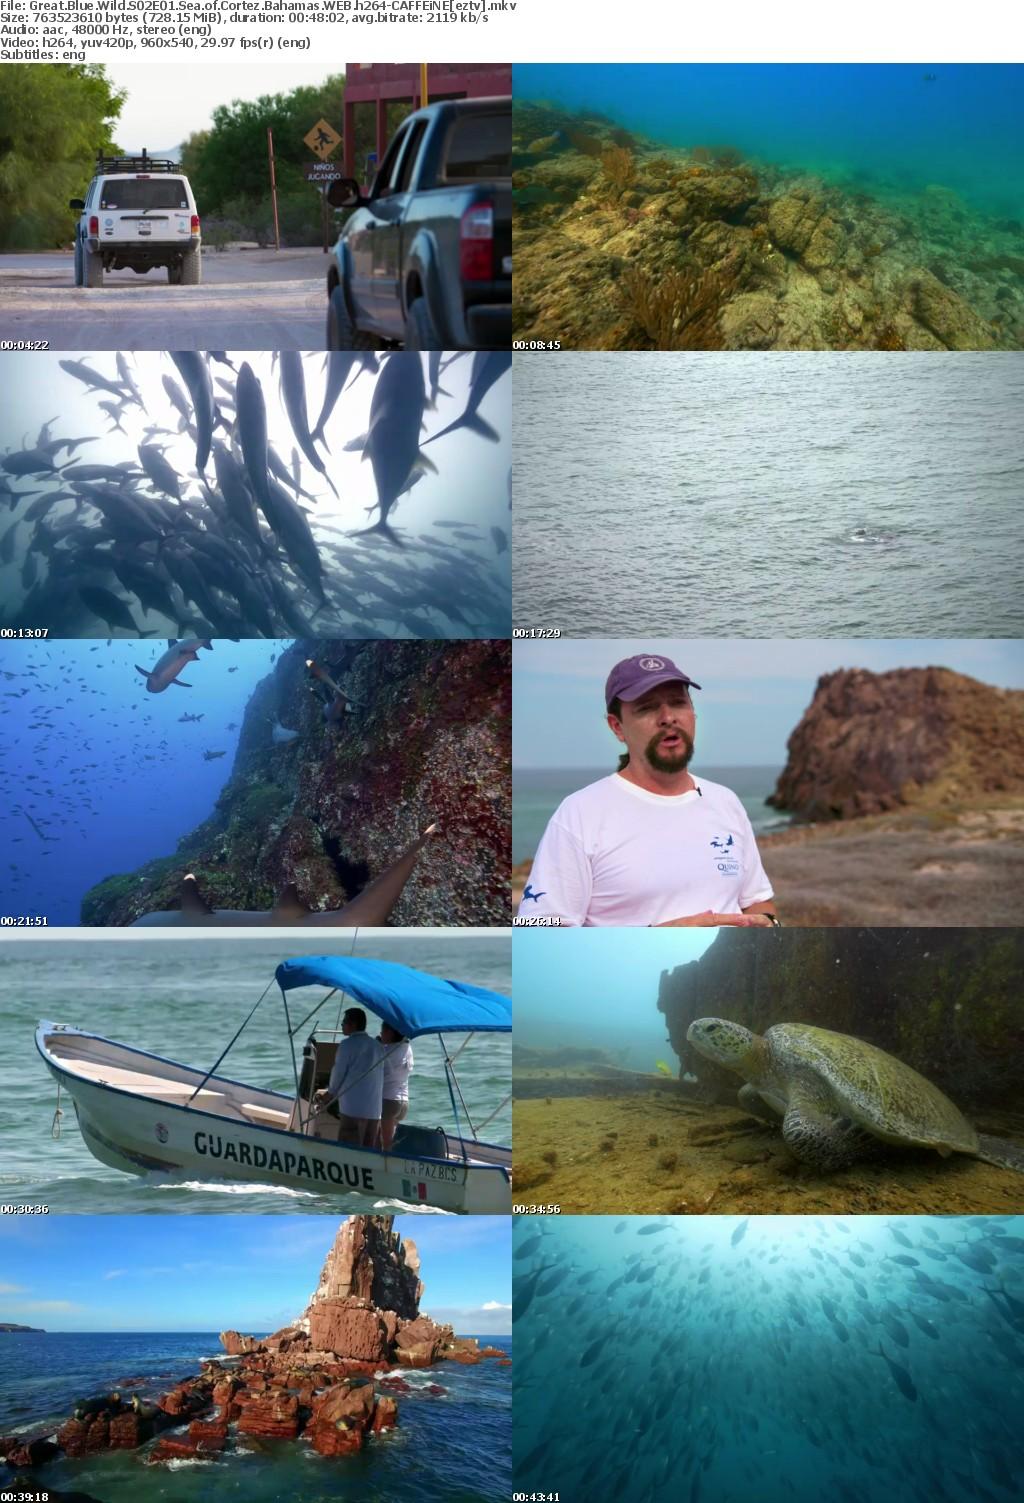 Great Blue Wild S02E01 Sea of Cortez Bahamas WEB h264-CAFFEiNE